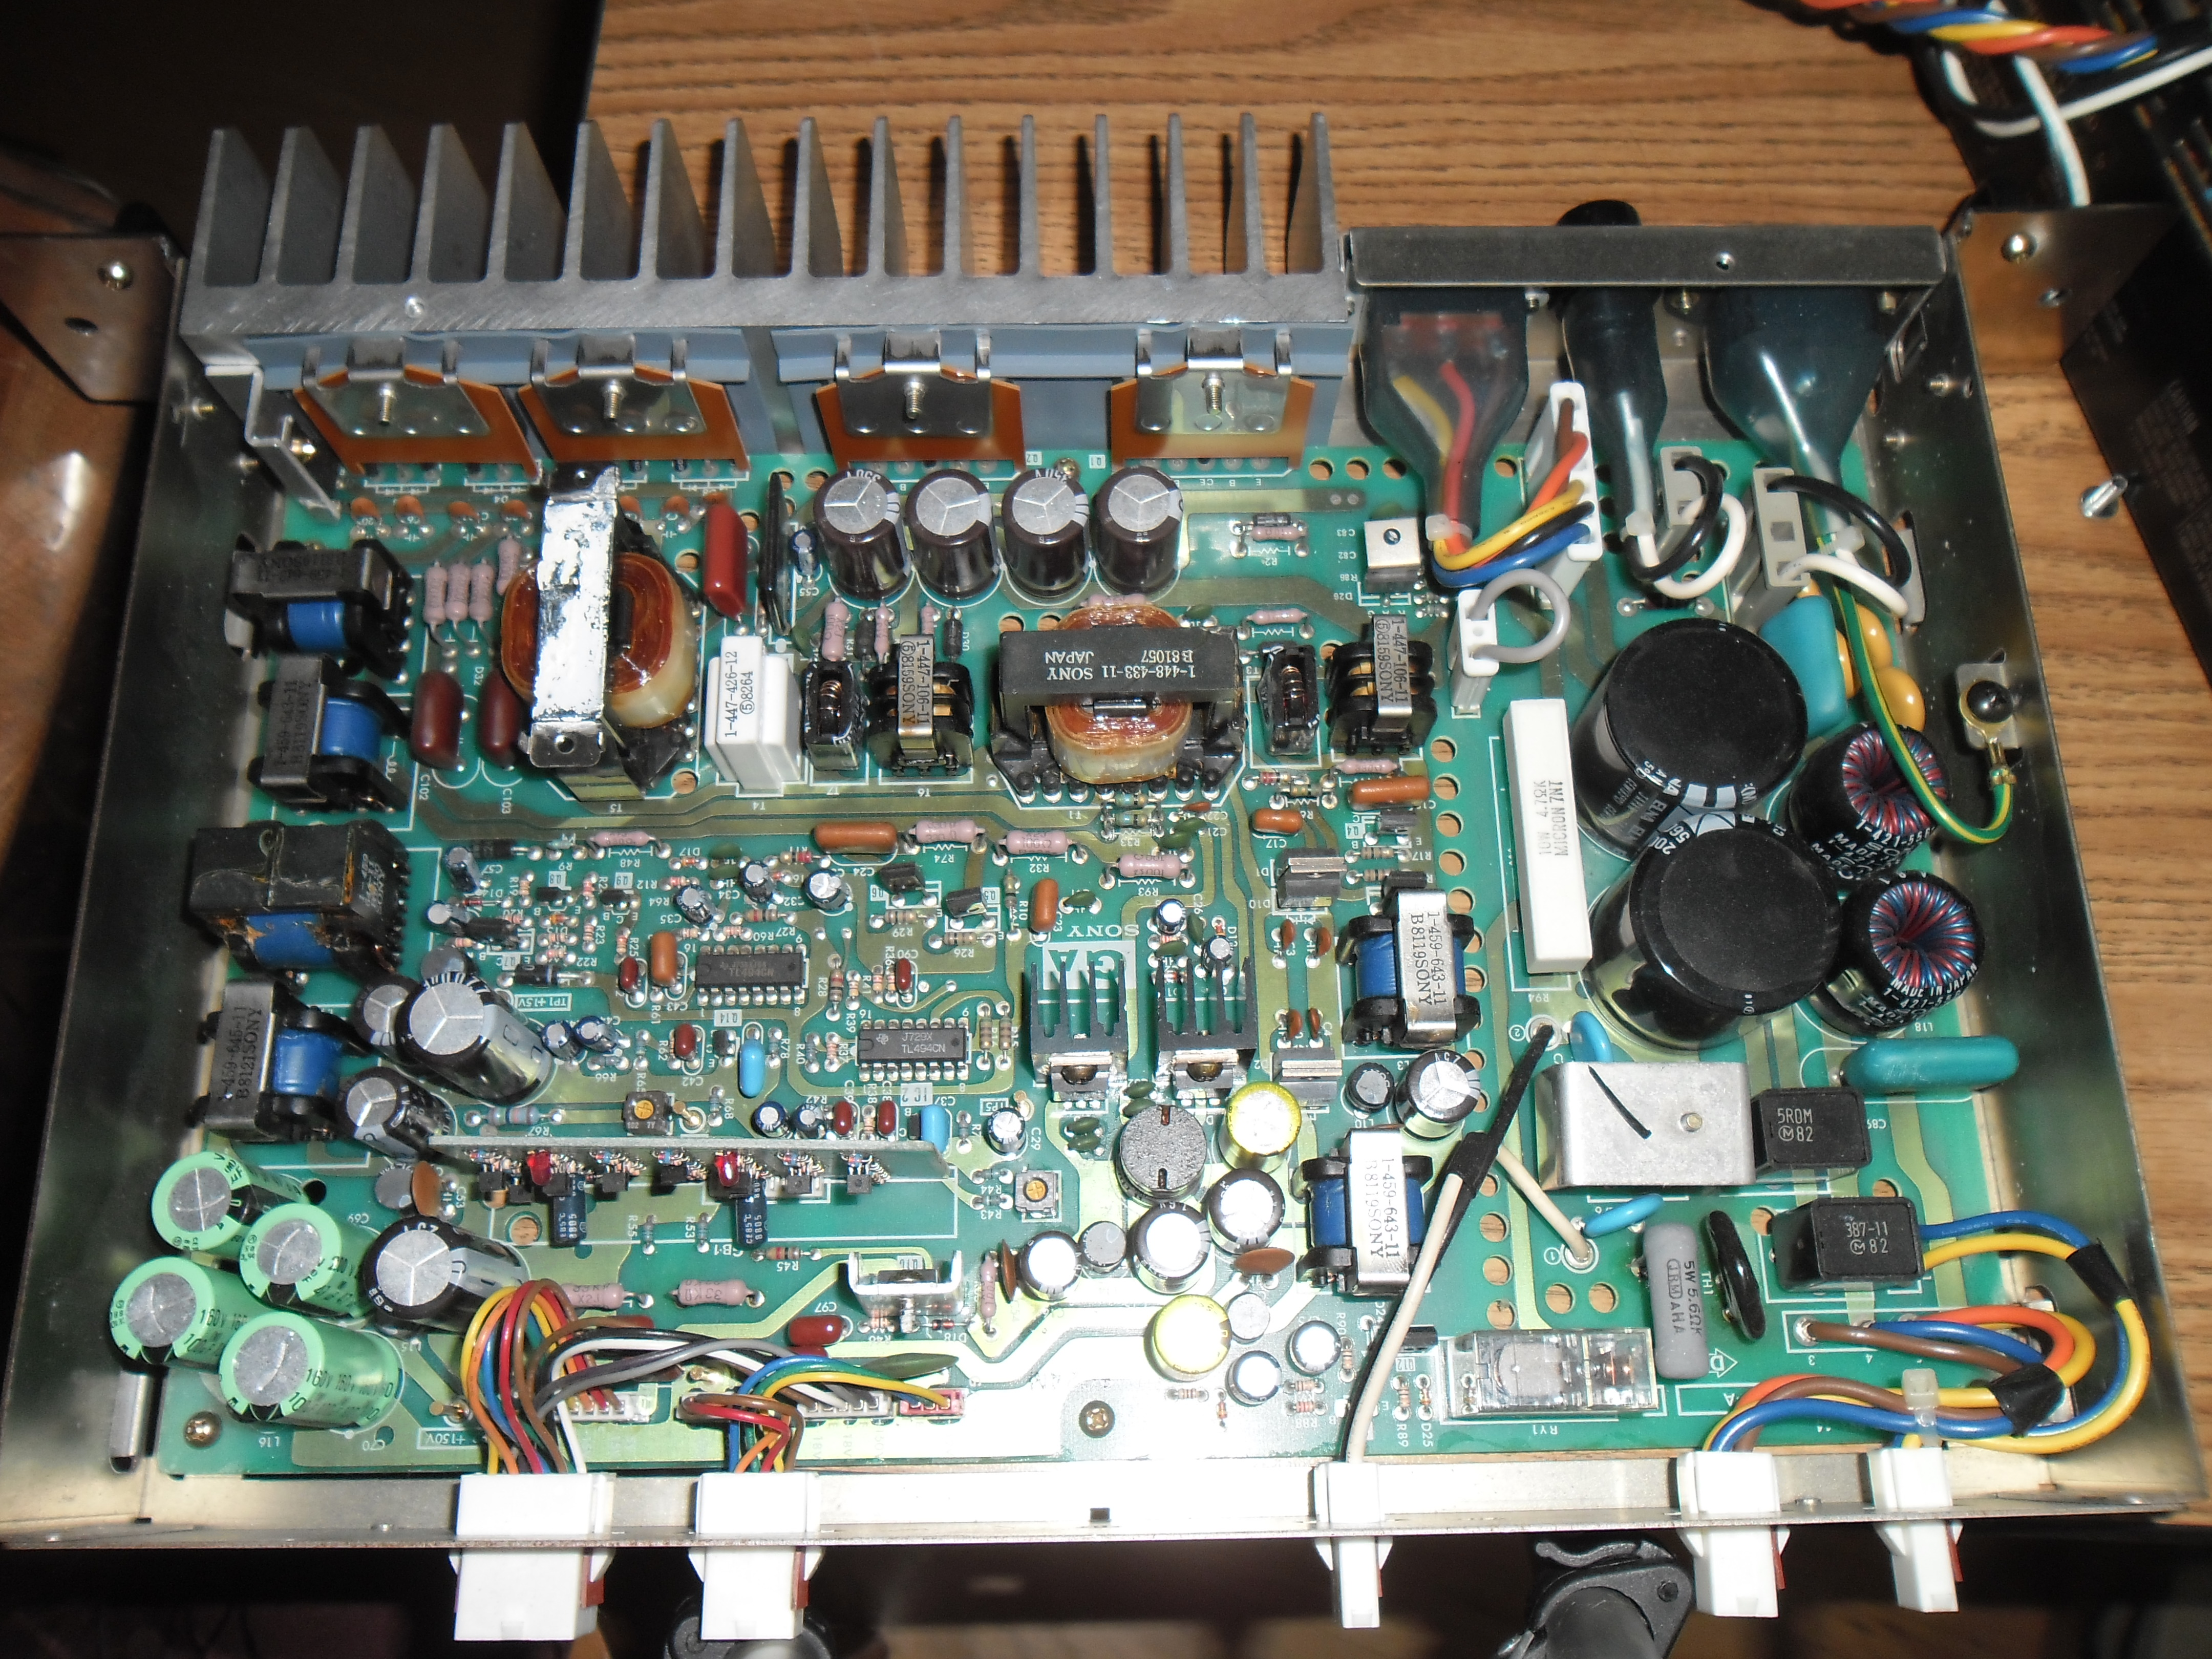 Vr Retro Games Pin Way Switch Diagram Multiple Lights Pdf 65kb On Pinterest 4082294